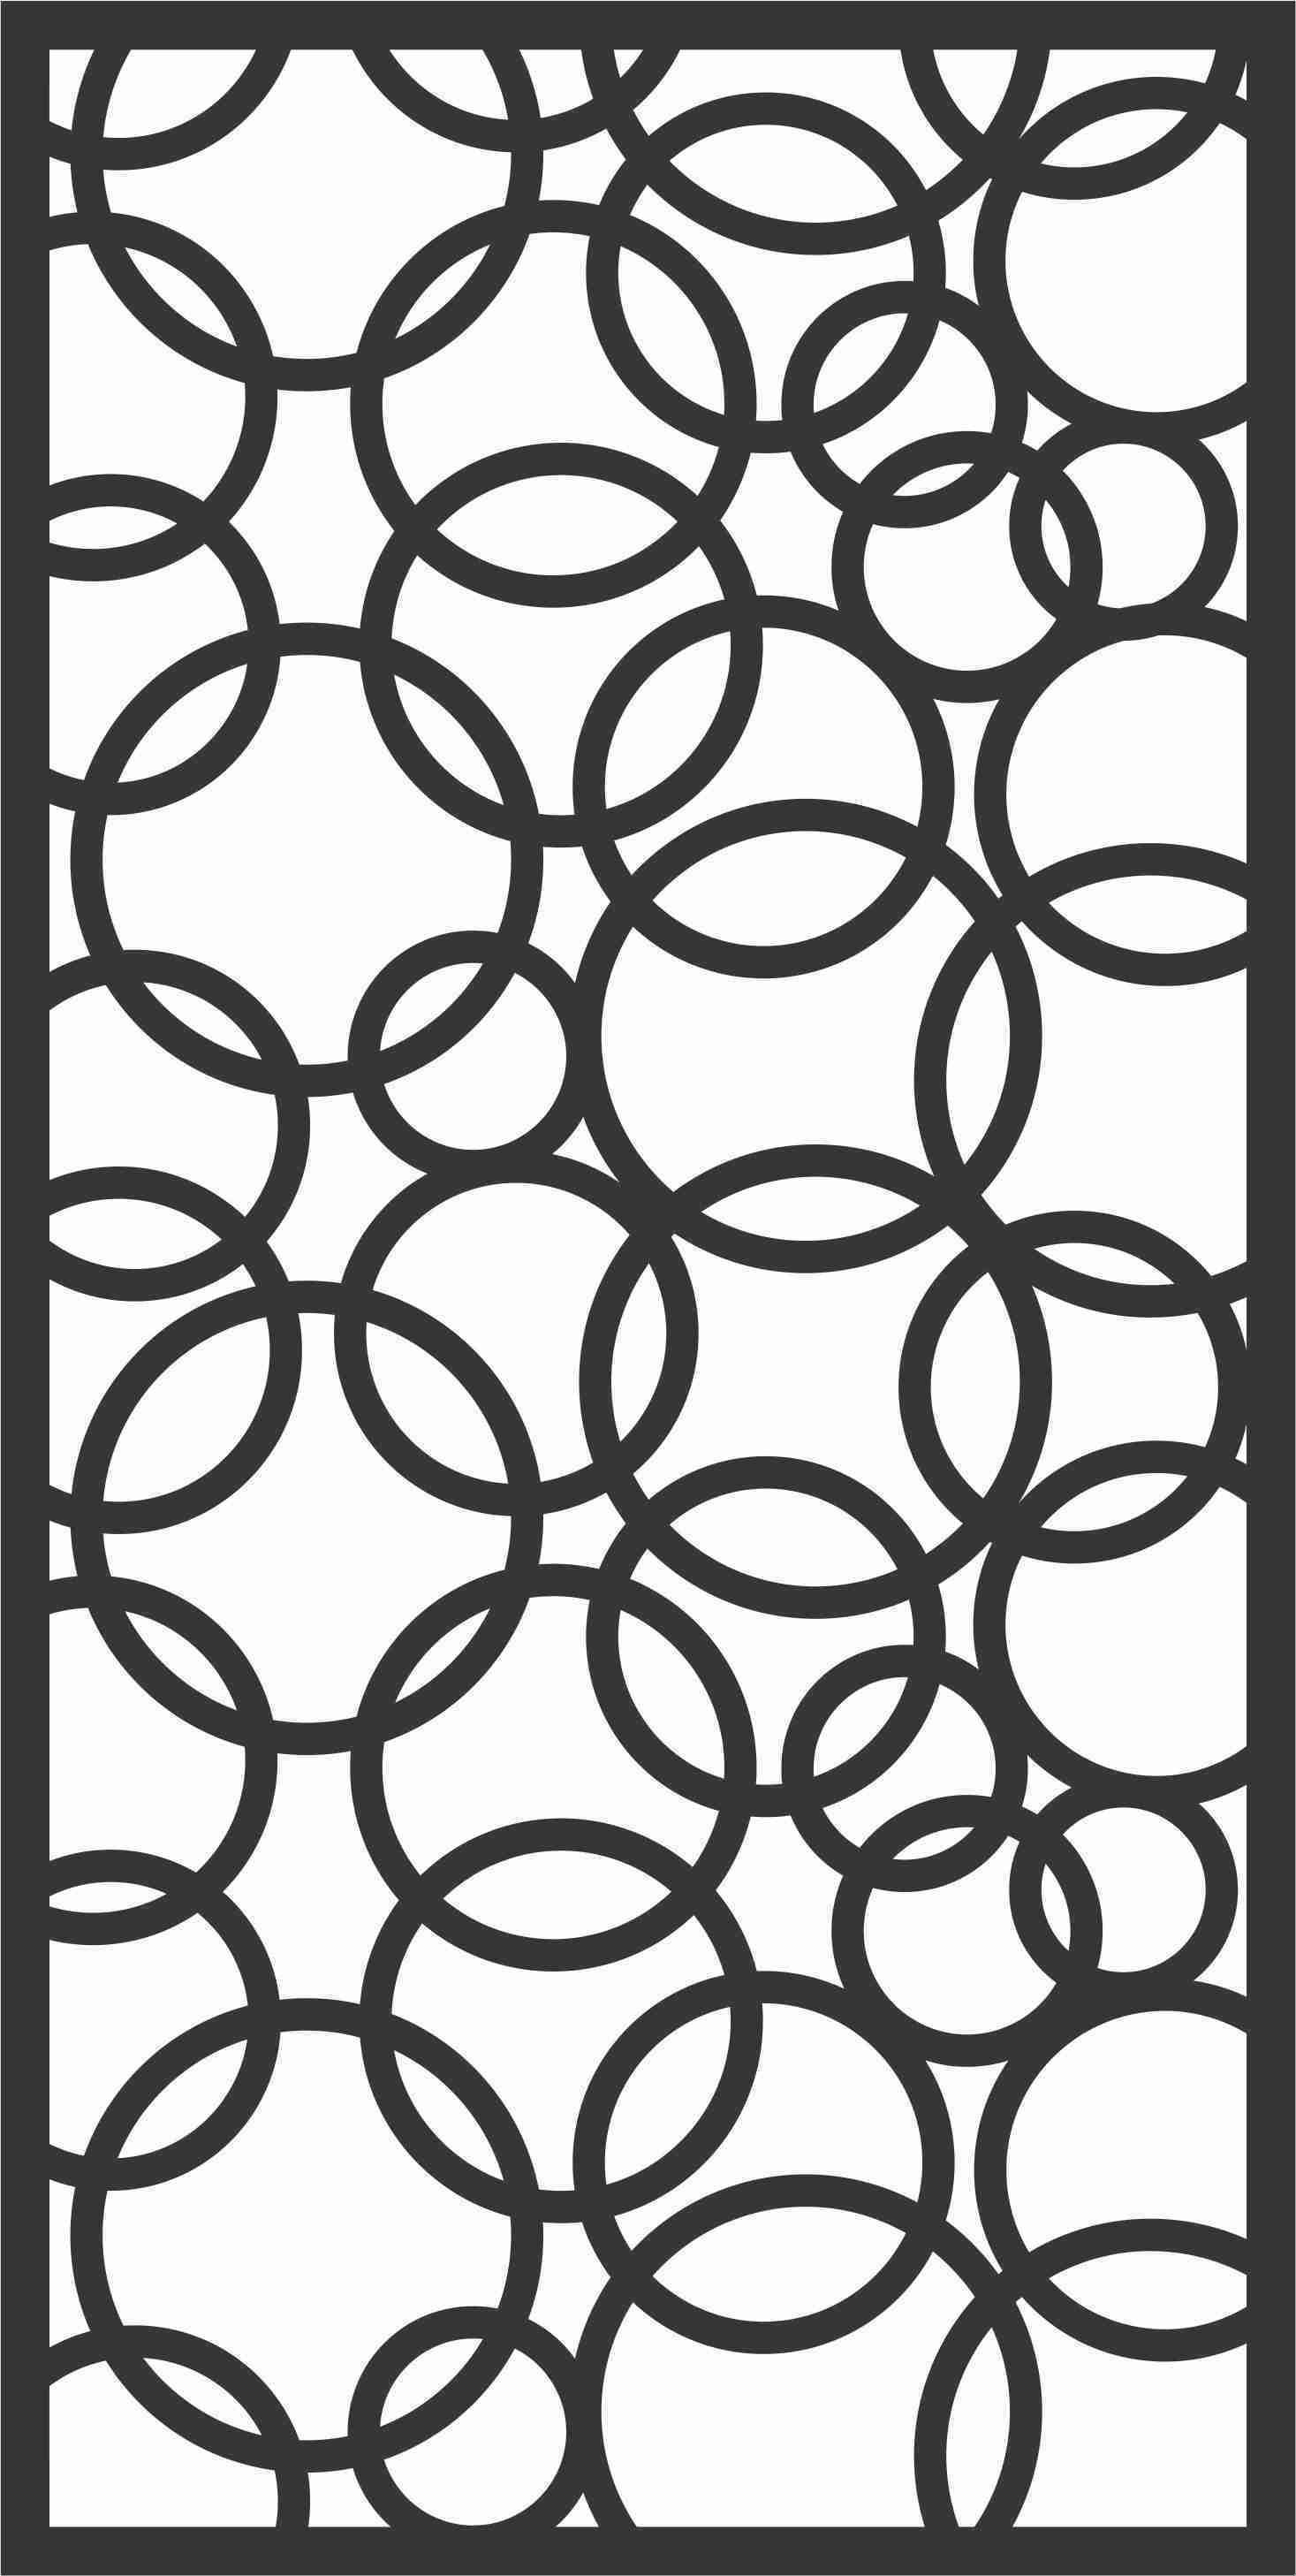 Screen Panel Patterns Seamless 27 Free DXF File